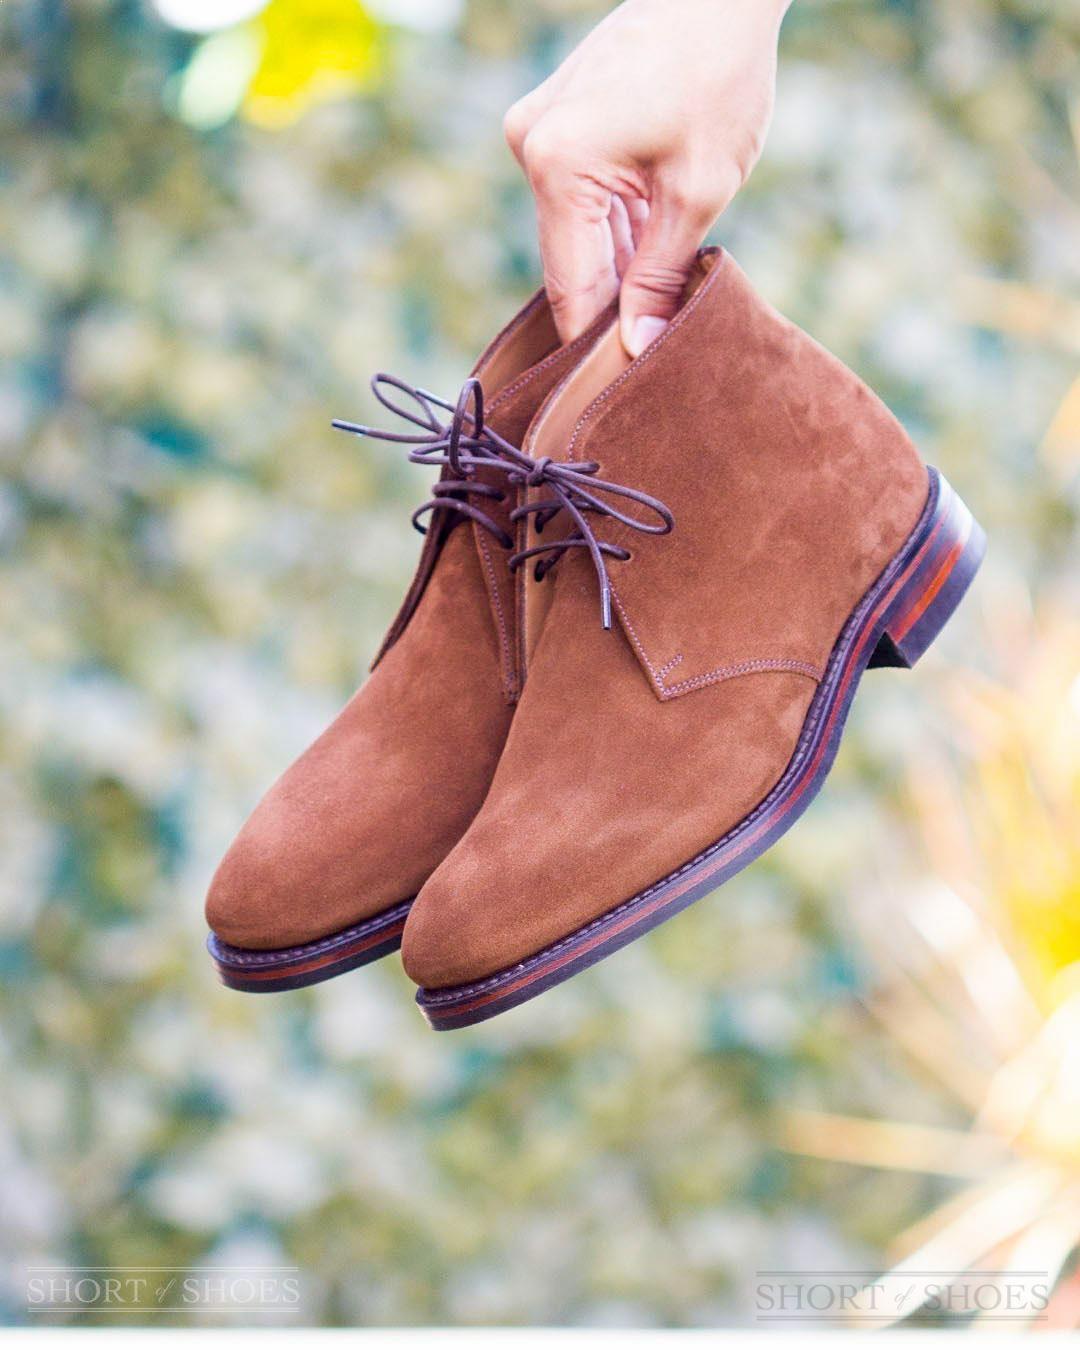 Loake Shoes Review Kempton Suede Chukka 1880 Line